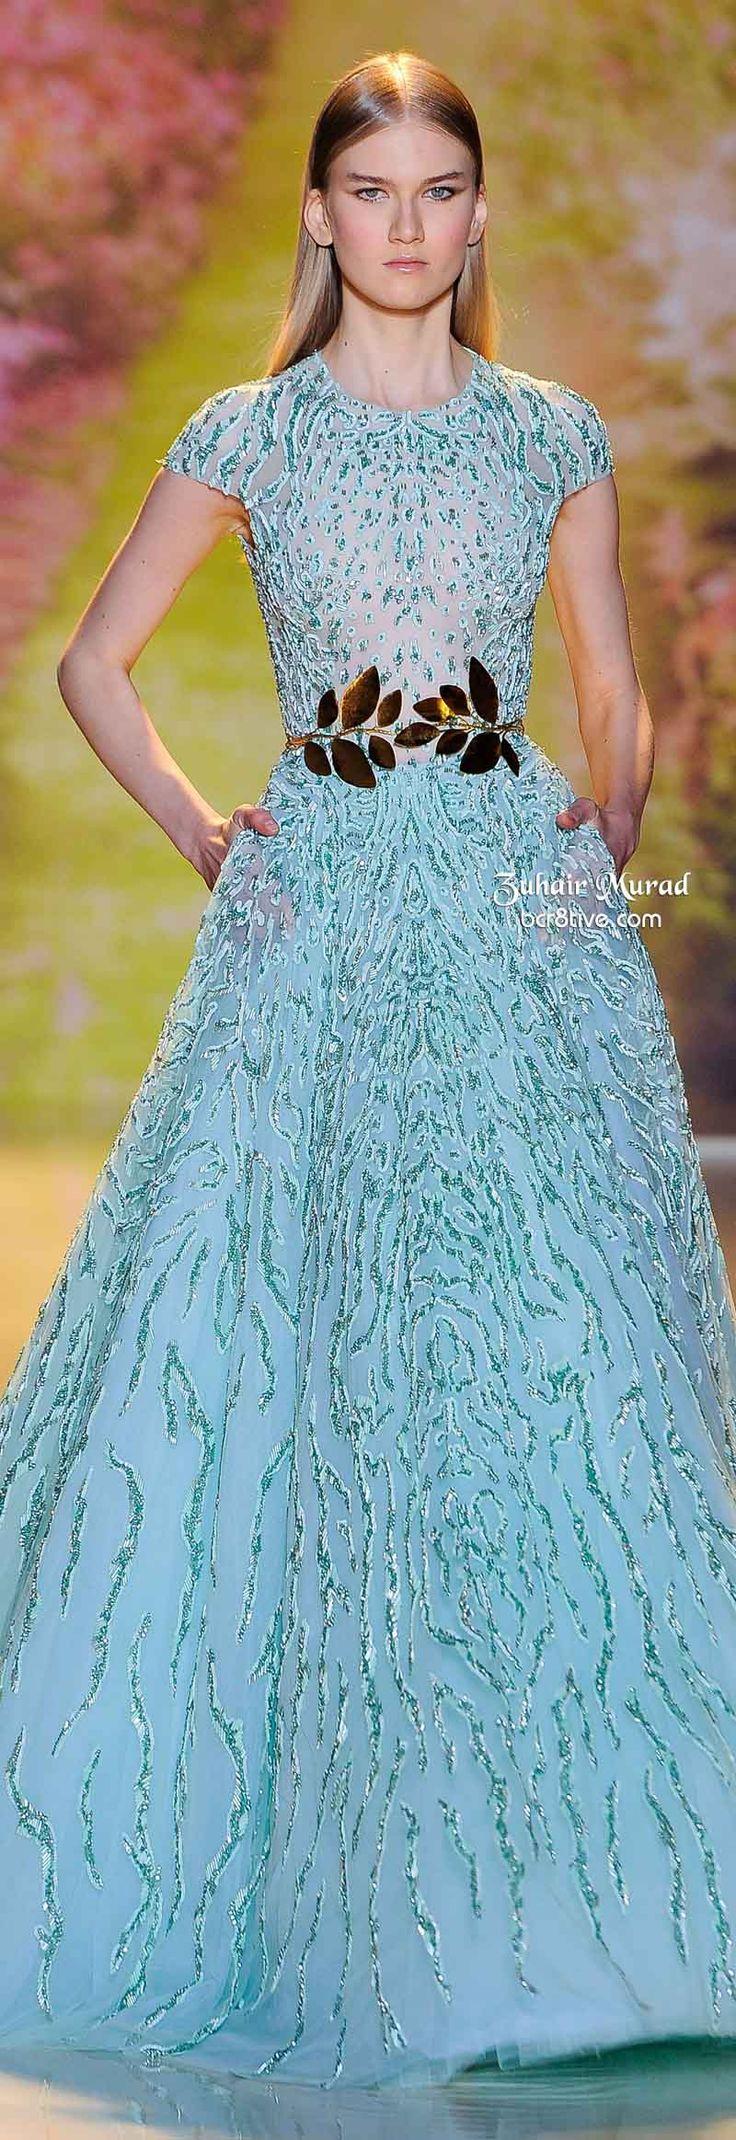 230 best Zuhair Murad images on Pinterest | High fashion, Dream ...